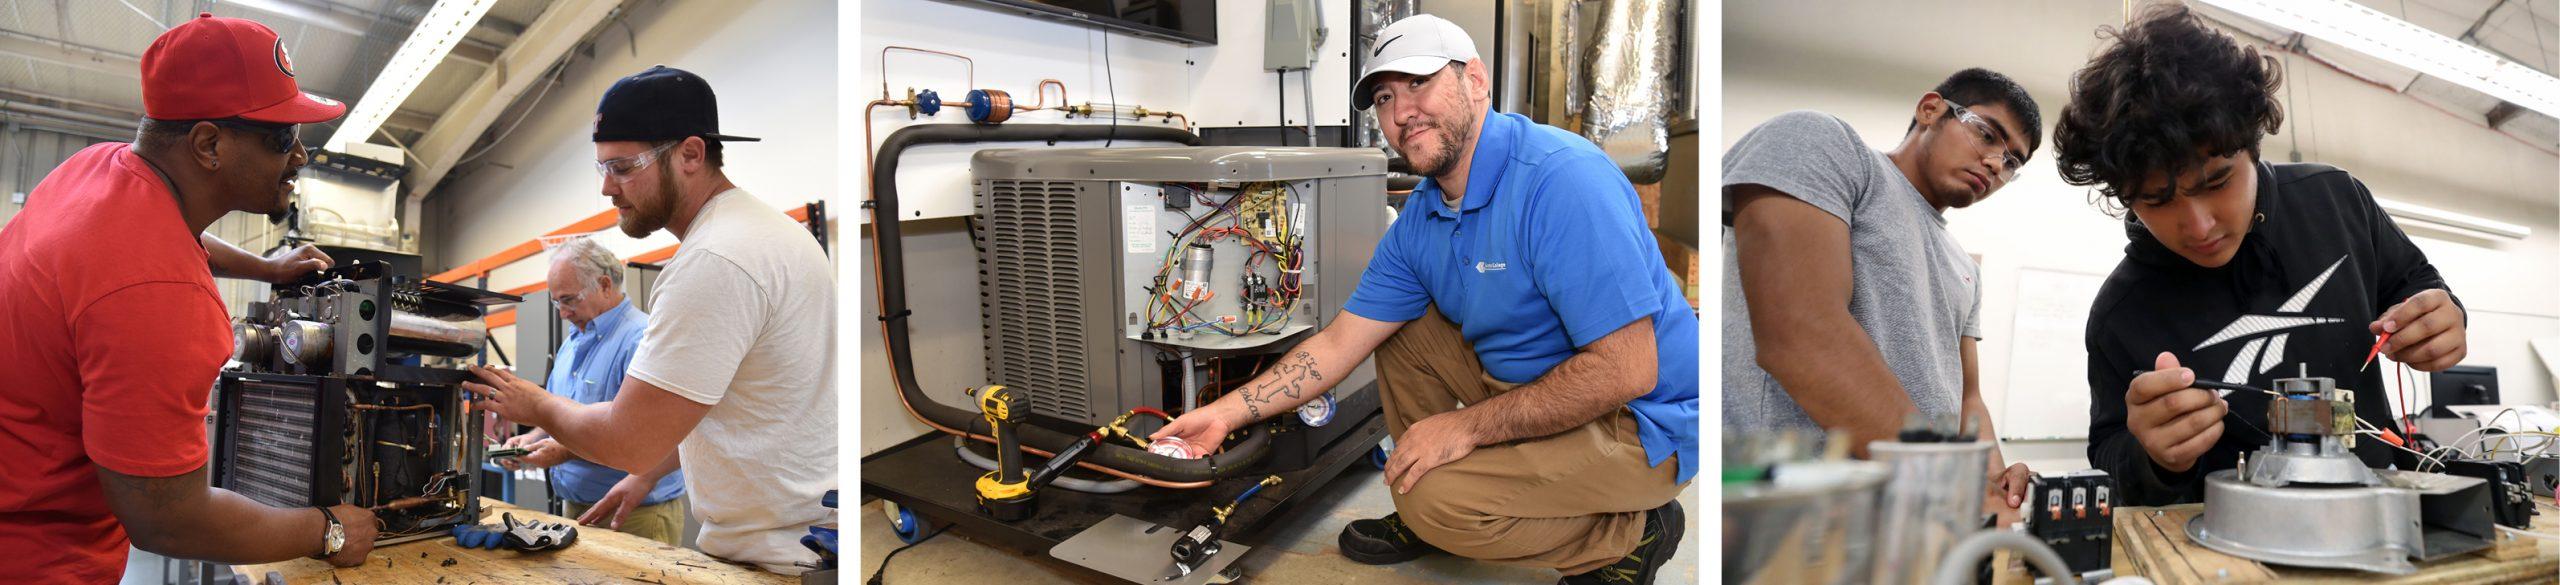 Galveston College HVAC Program Photos